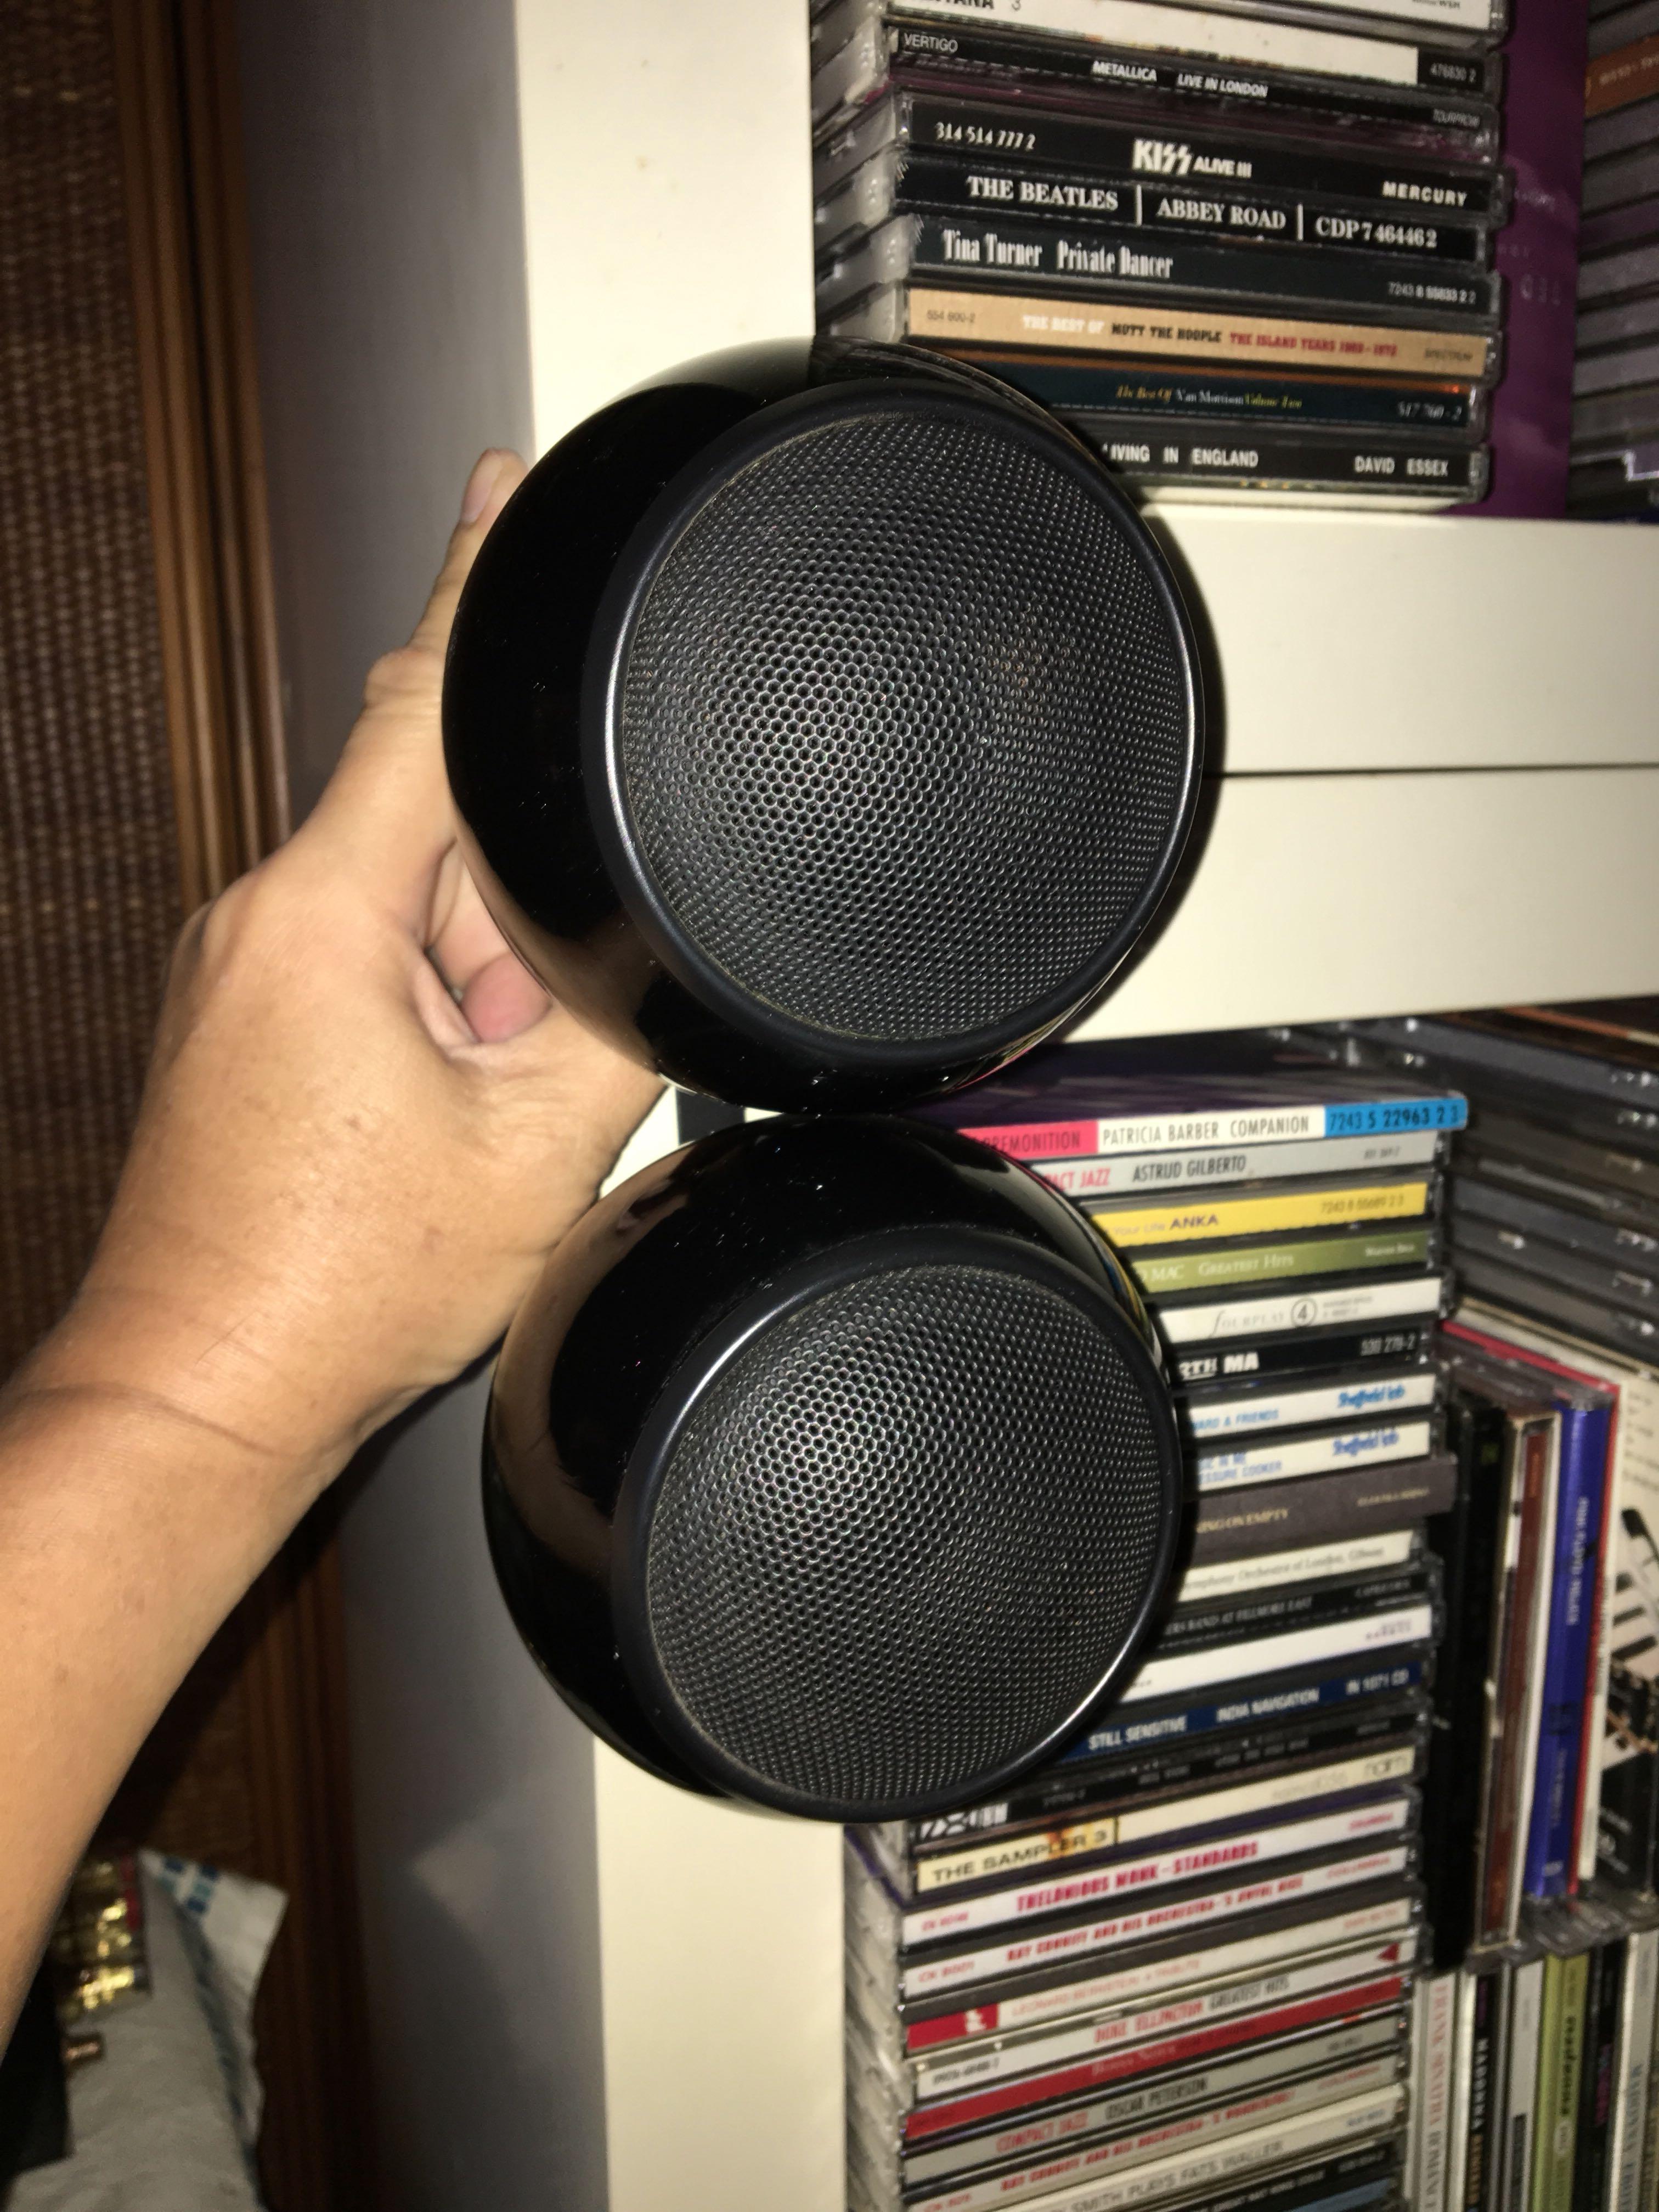 Orb ball shape speakers Orb_ball_shape_speakers_1560042994_9d658dc2